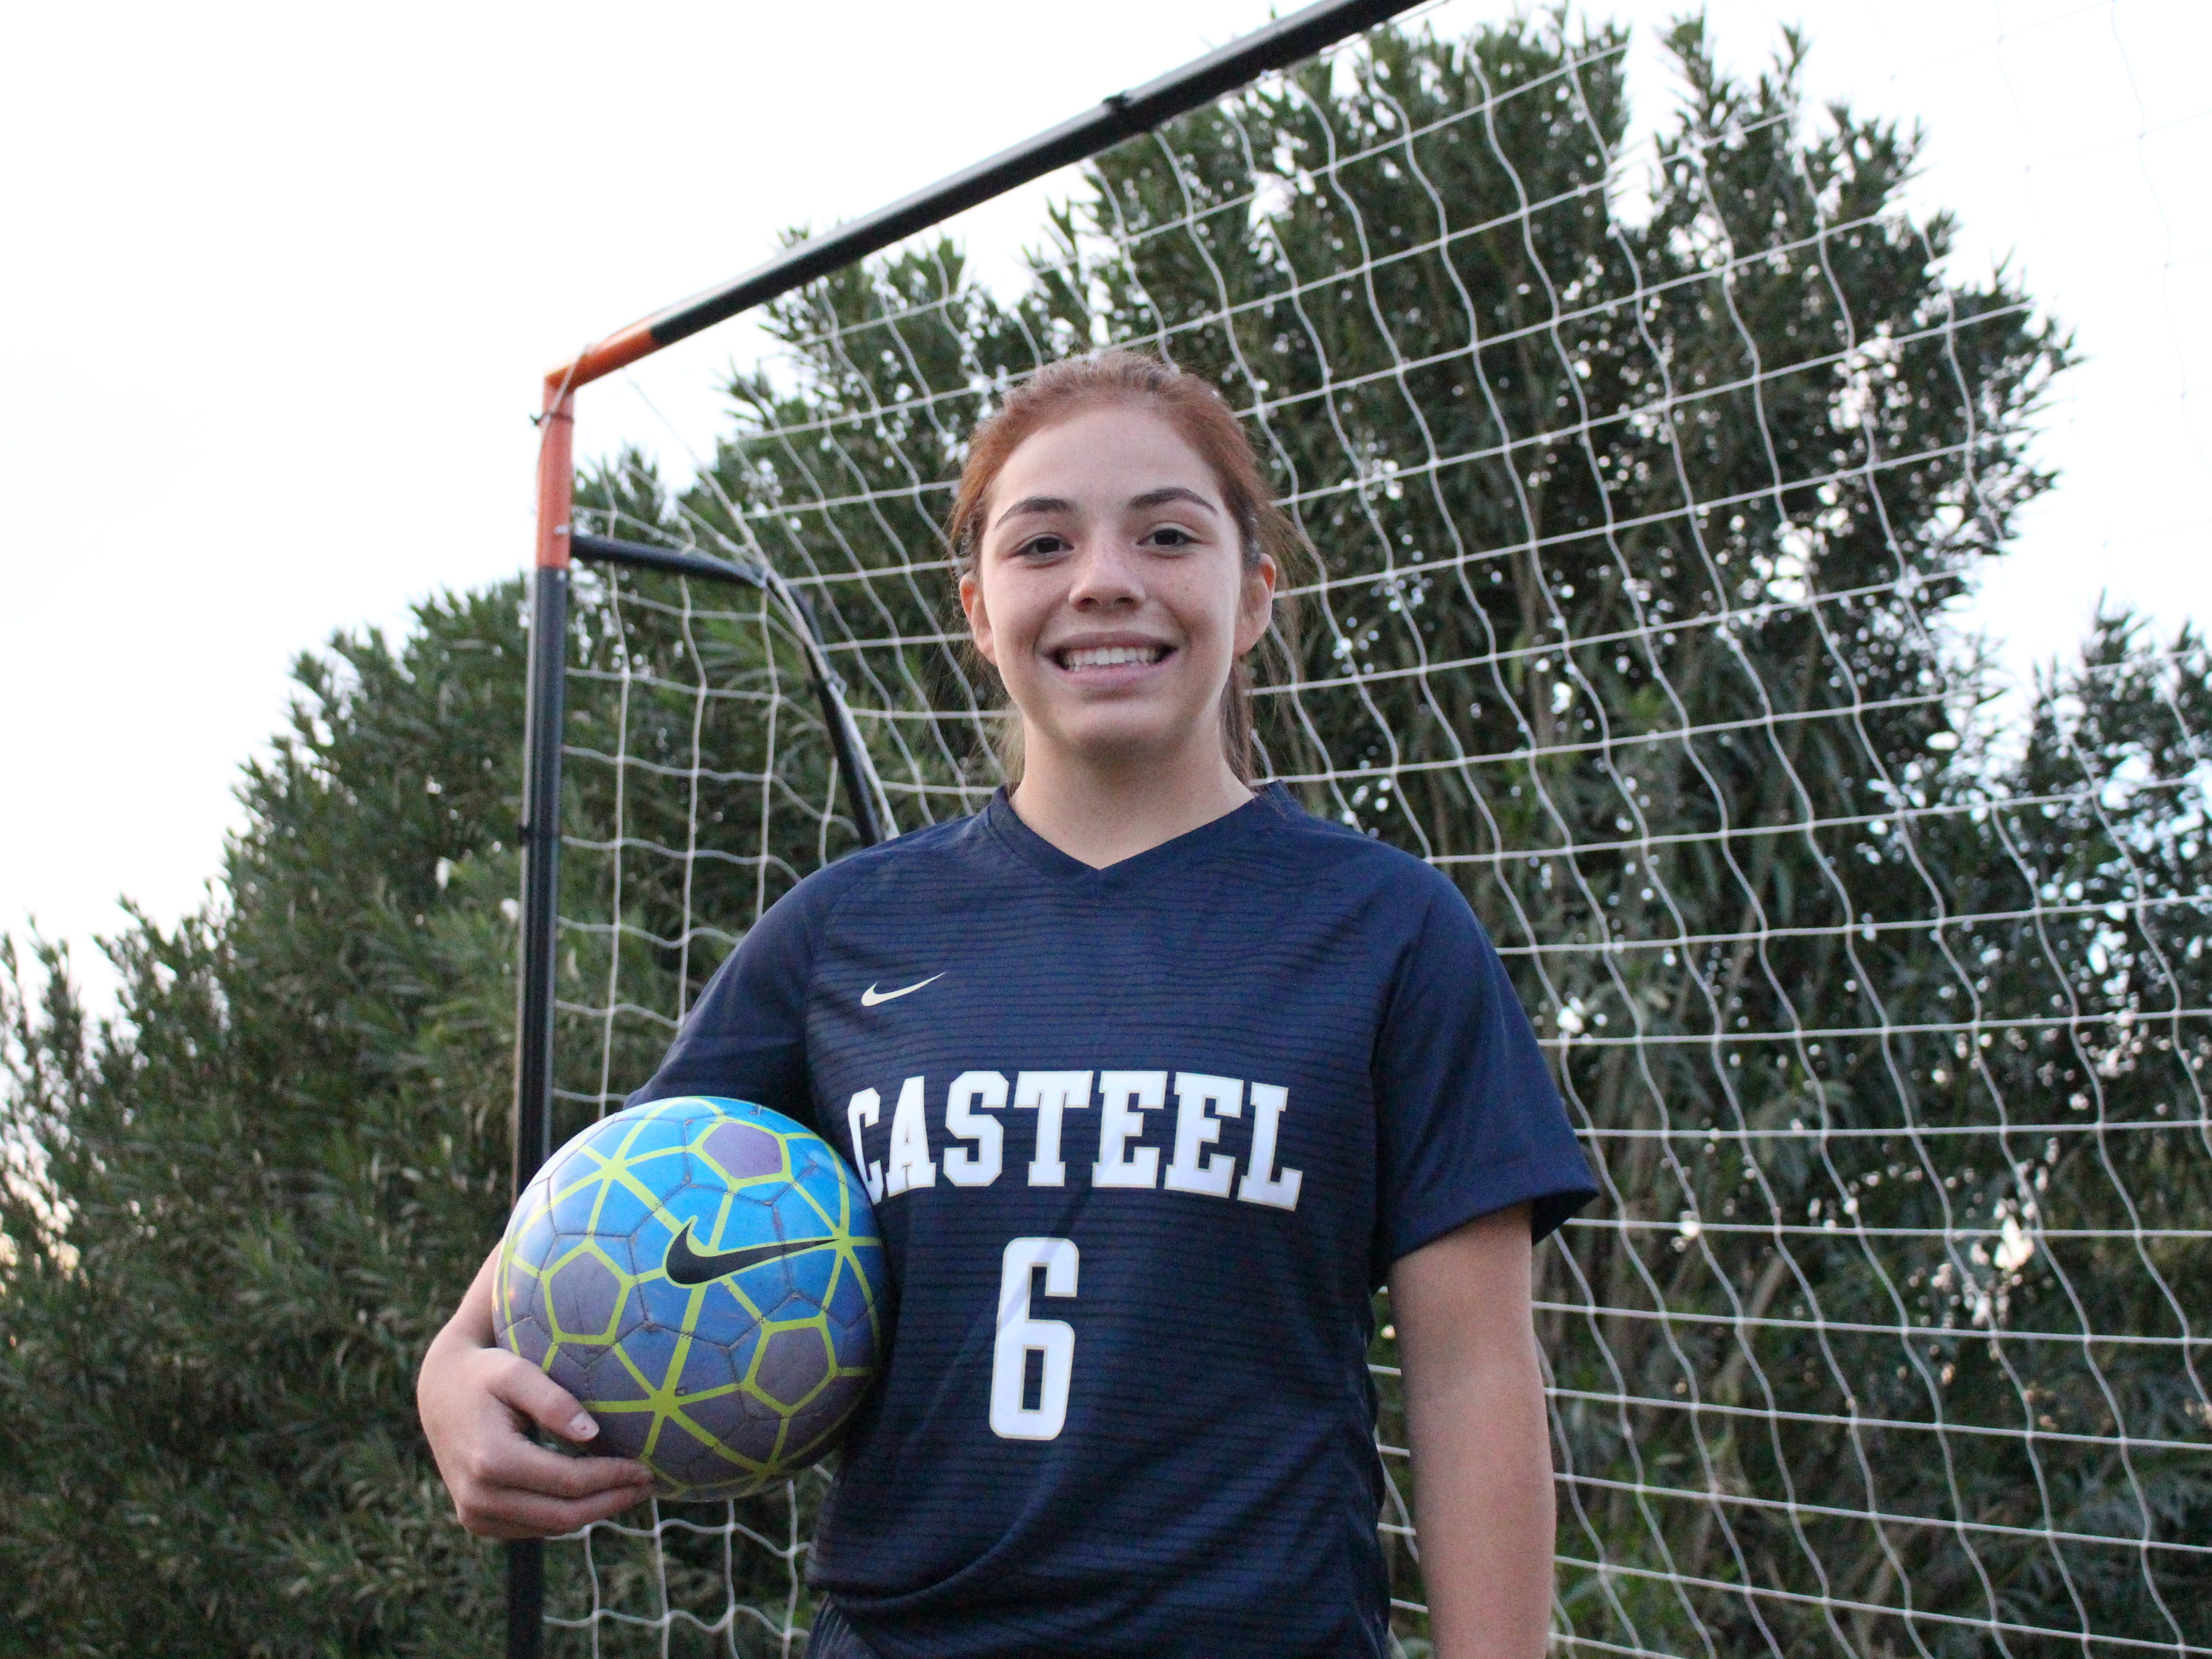 Casteel's Scarlett Frohardt poses near her goal on Wednesday in Queen Creek on Nov. 14, 2018.